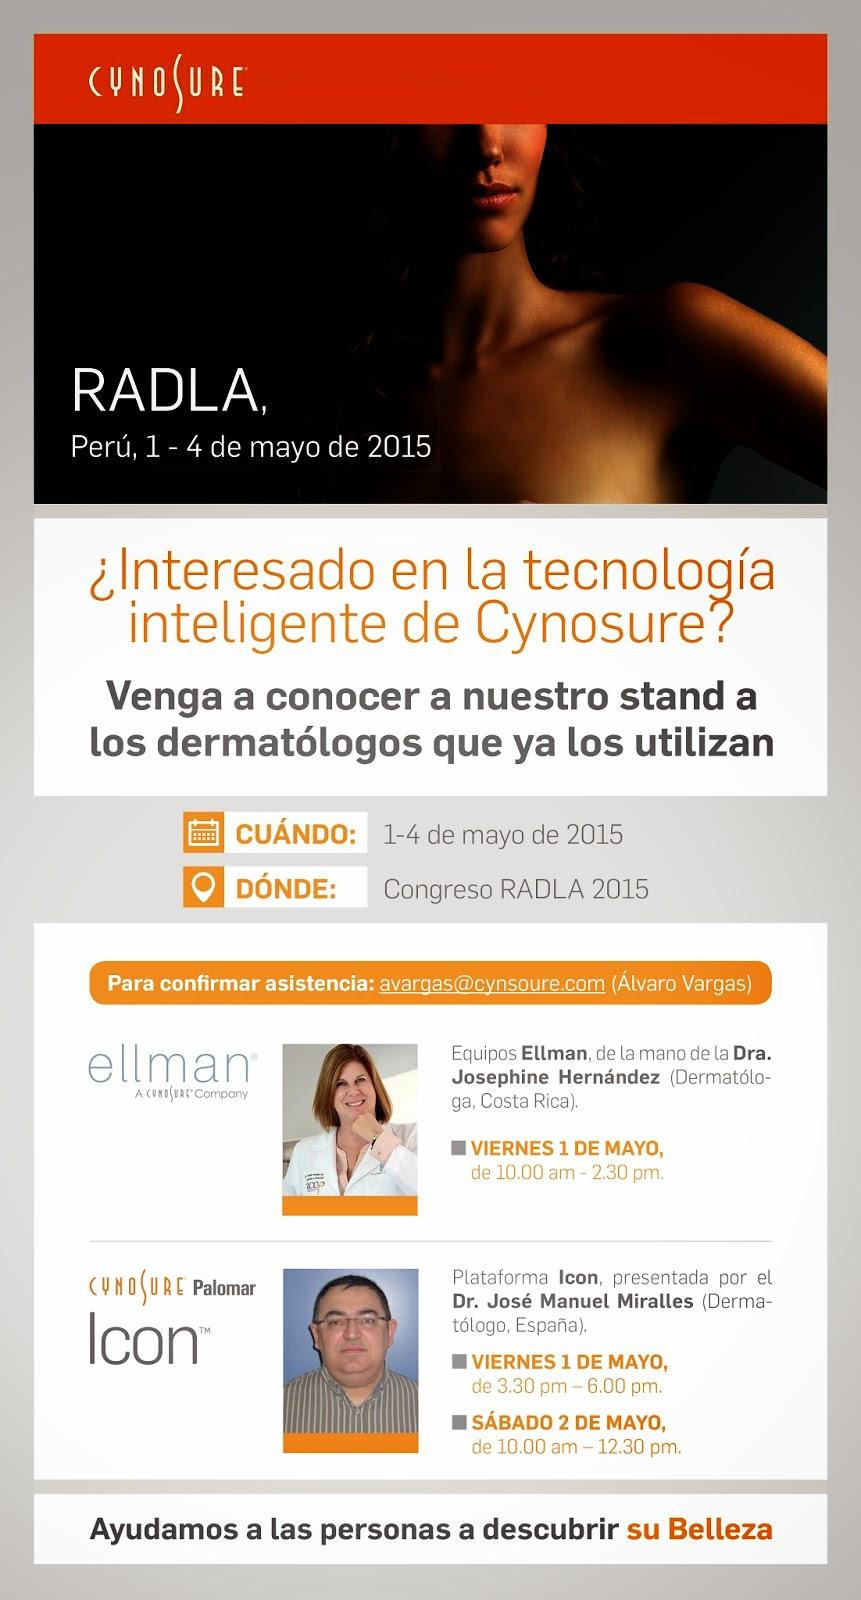 RADLA-2015-dermatologia-Miralles-Cynosure-Spain